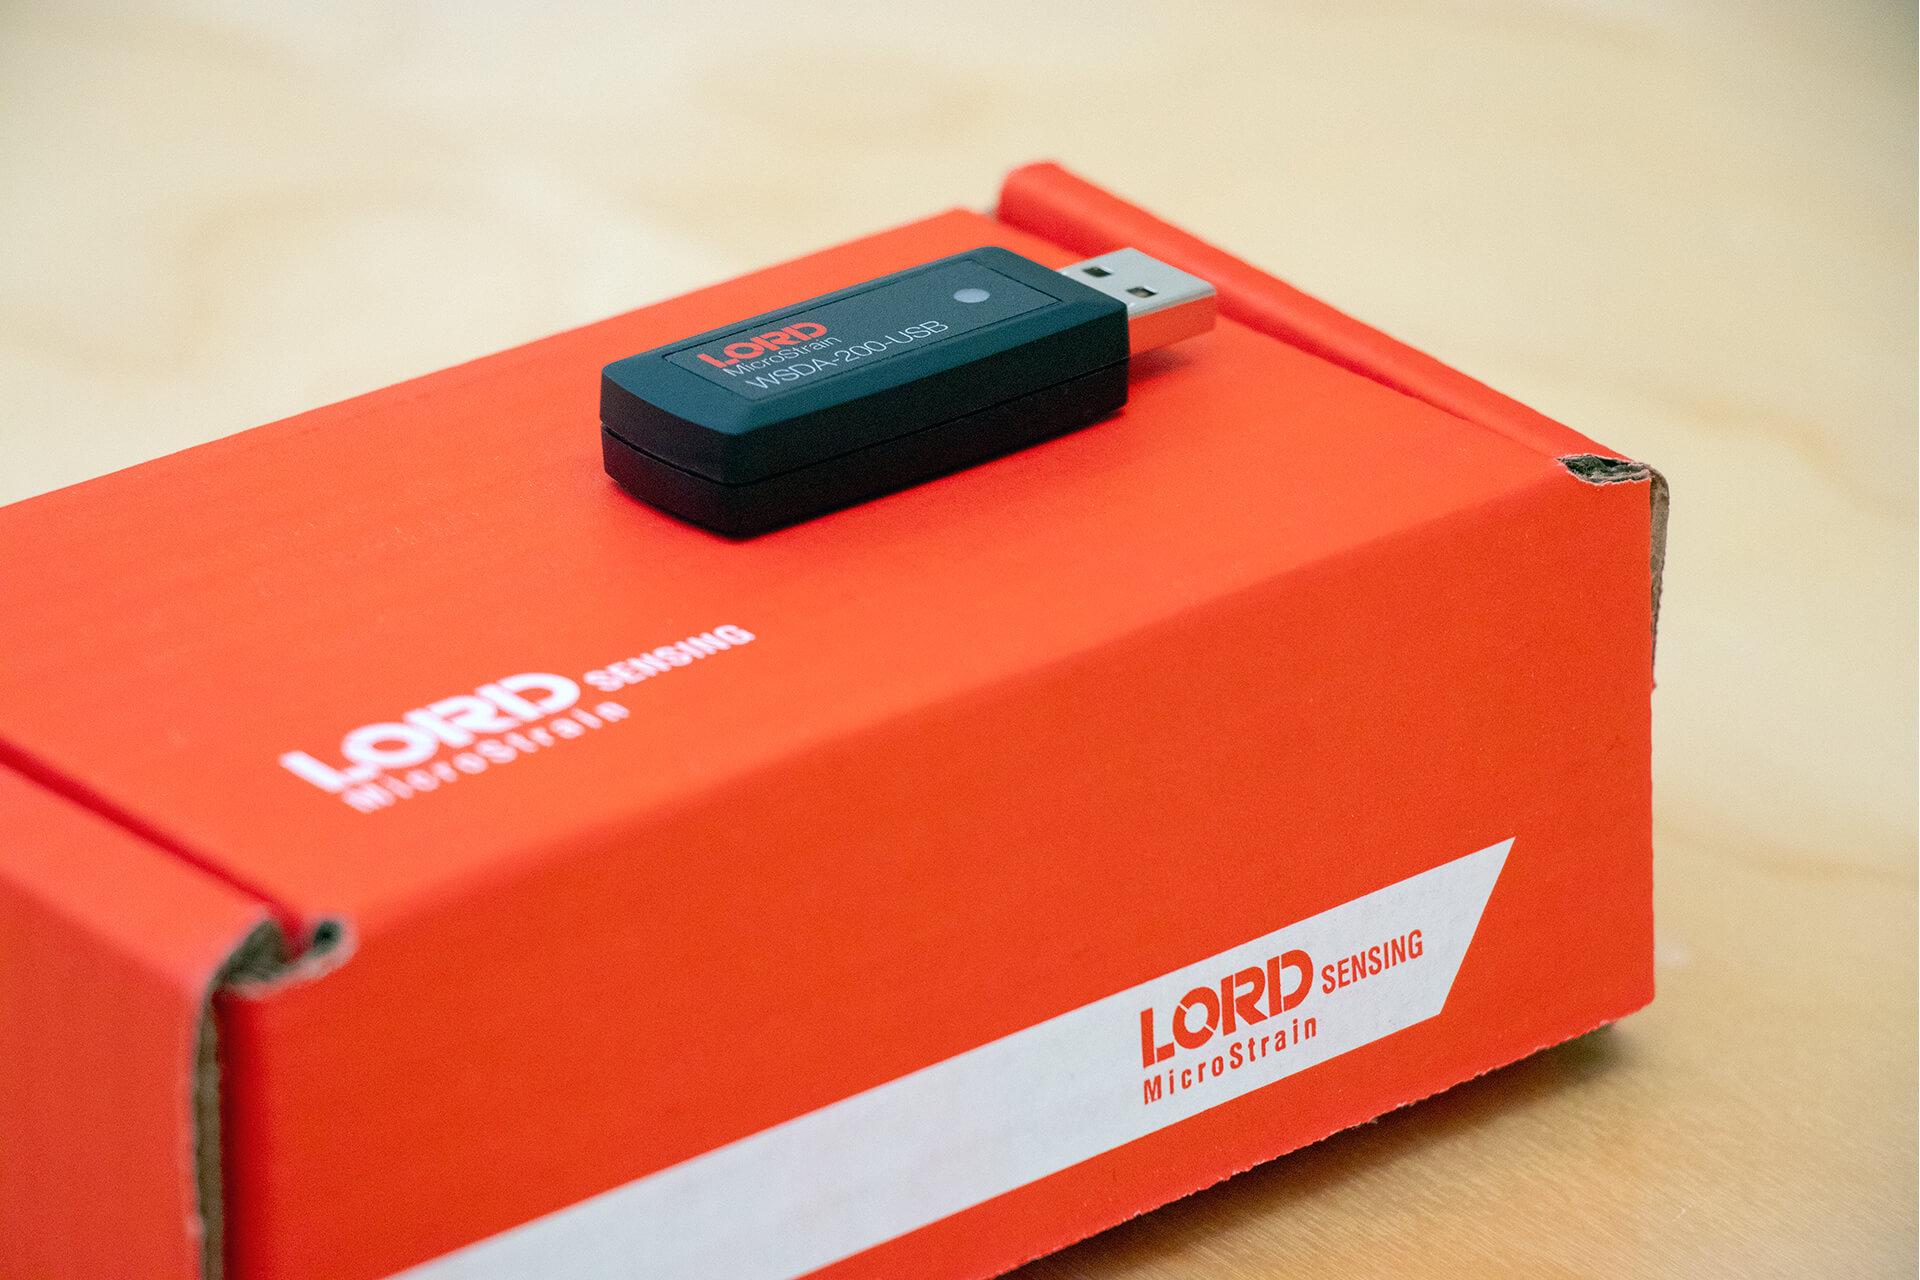 WSDA-200-USB